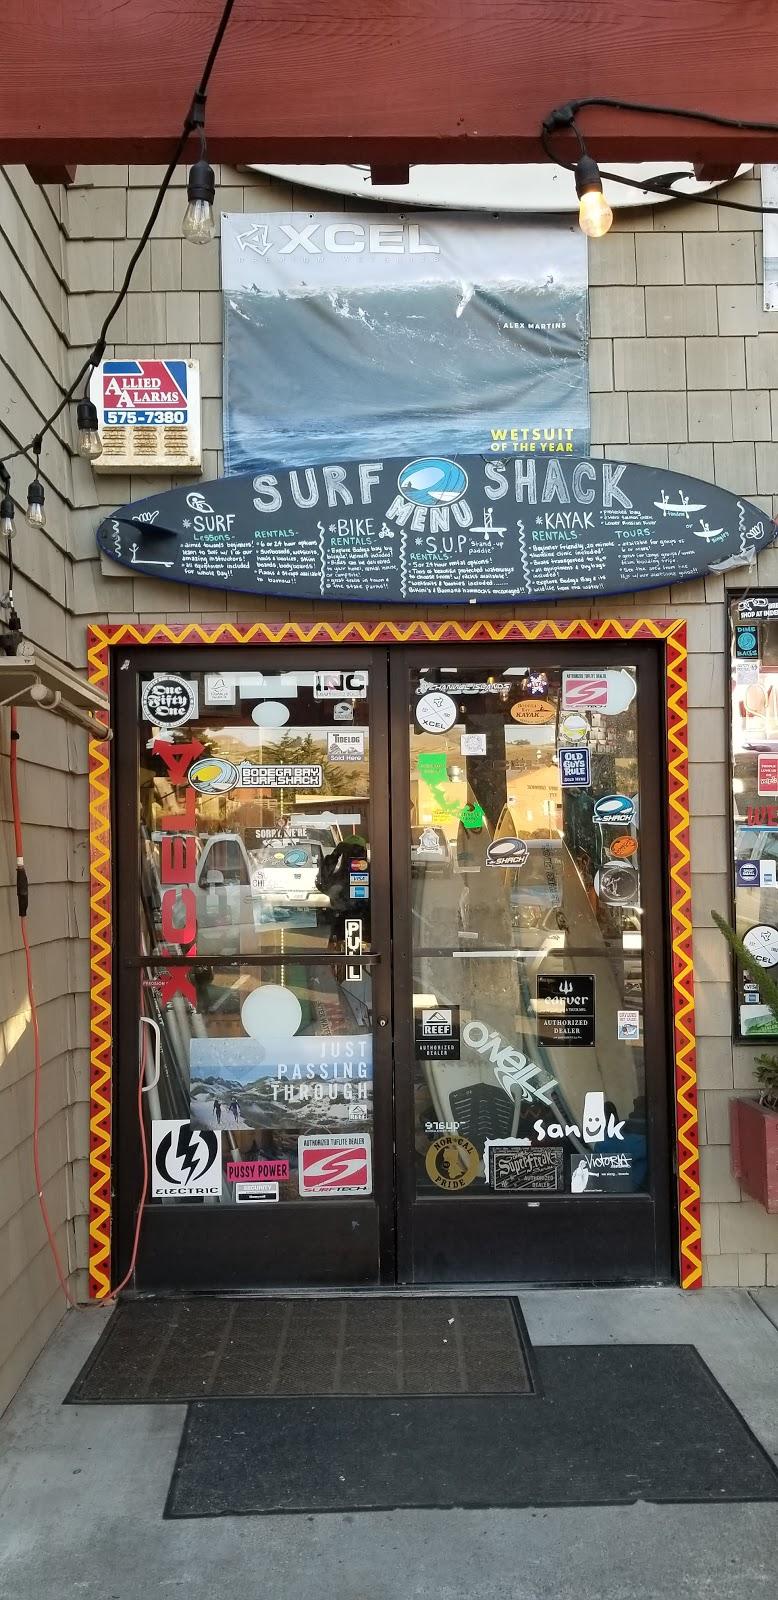 Bodega Bay Surf Shack - store  | Photo 7 of 8 | Address: 1400 CA-1 e, Bodega Bay, CA 94923, USA | Phone: (707) 875-3944